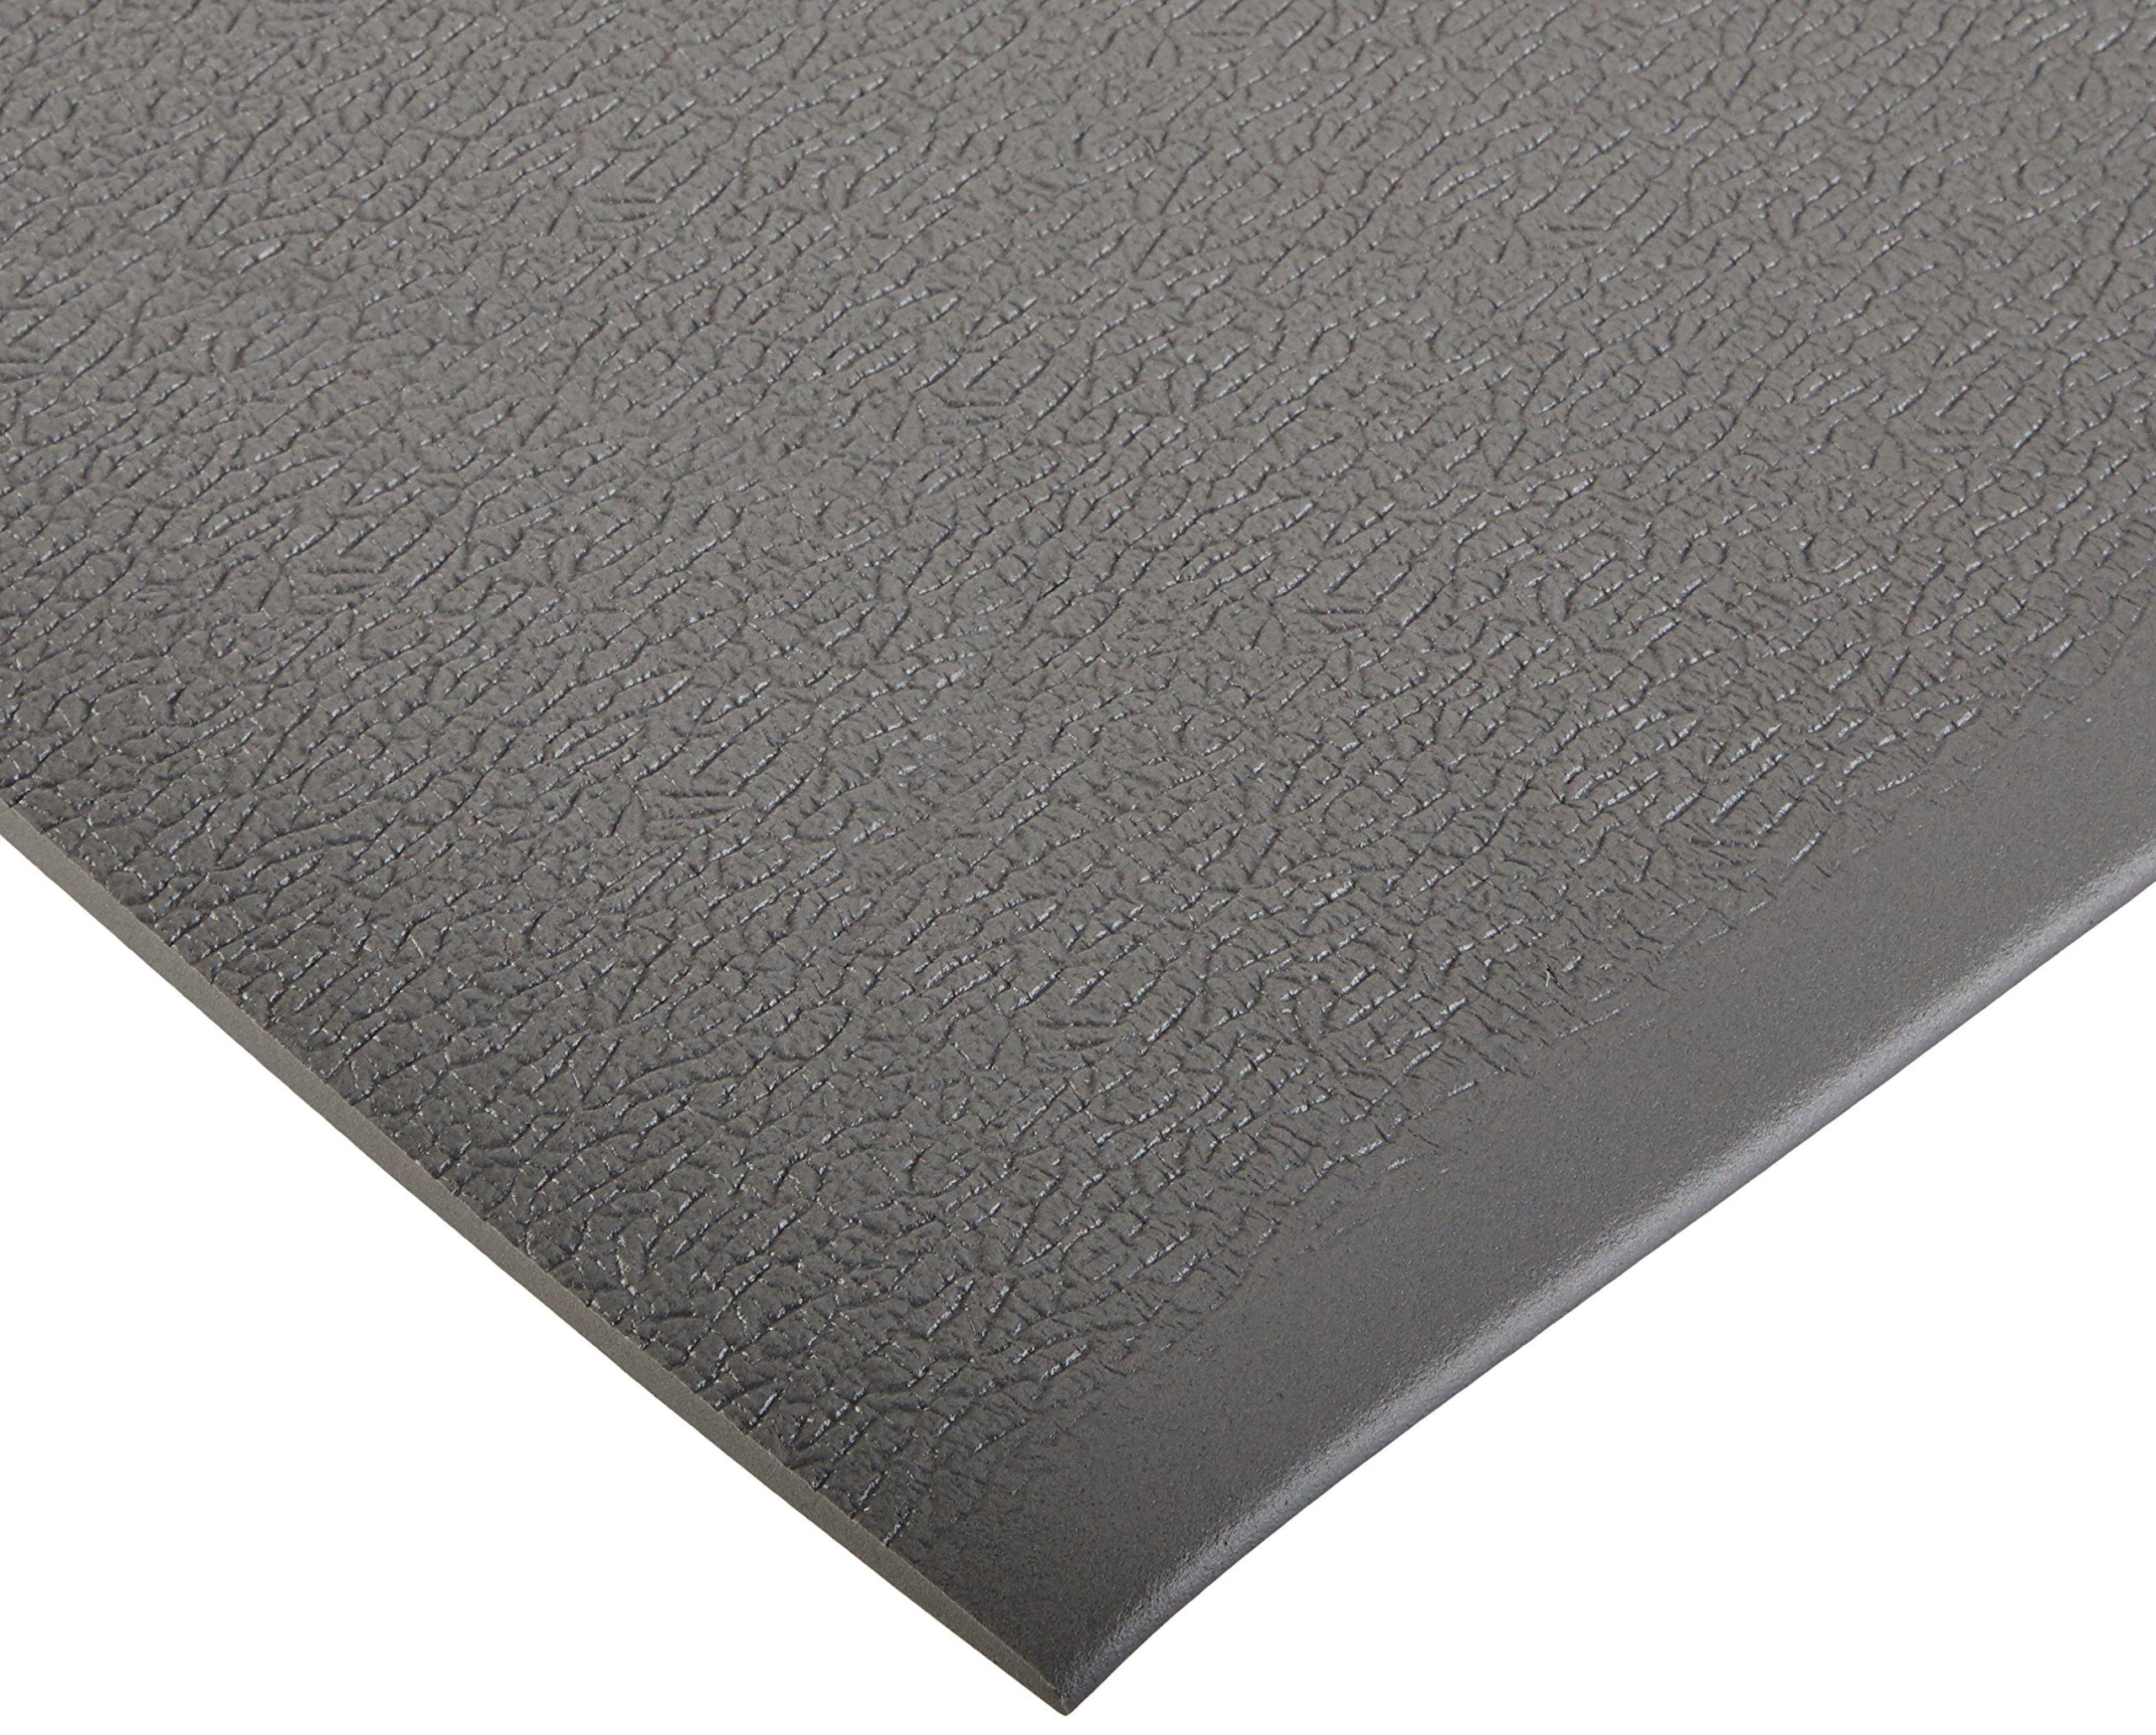 Bertech ESD Anti Fatigue Floor Mat Roll, 3' Wide x 10' Long x 0.375'' Thick, Gray (Made in USA)